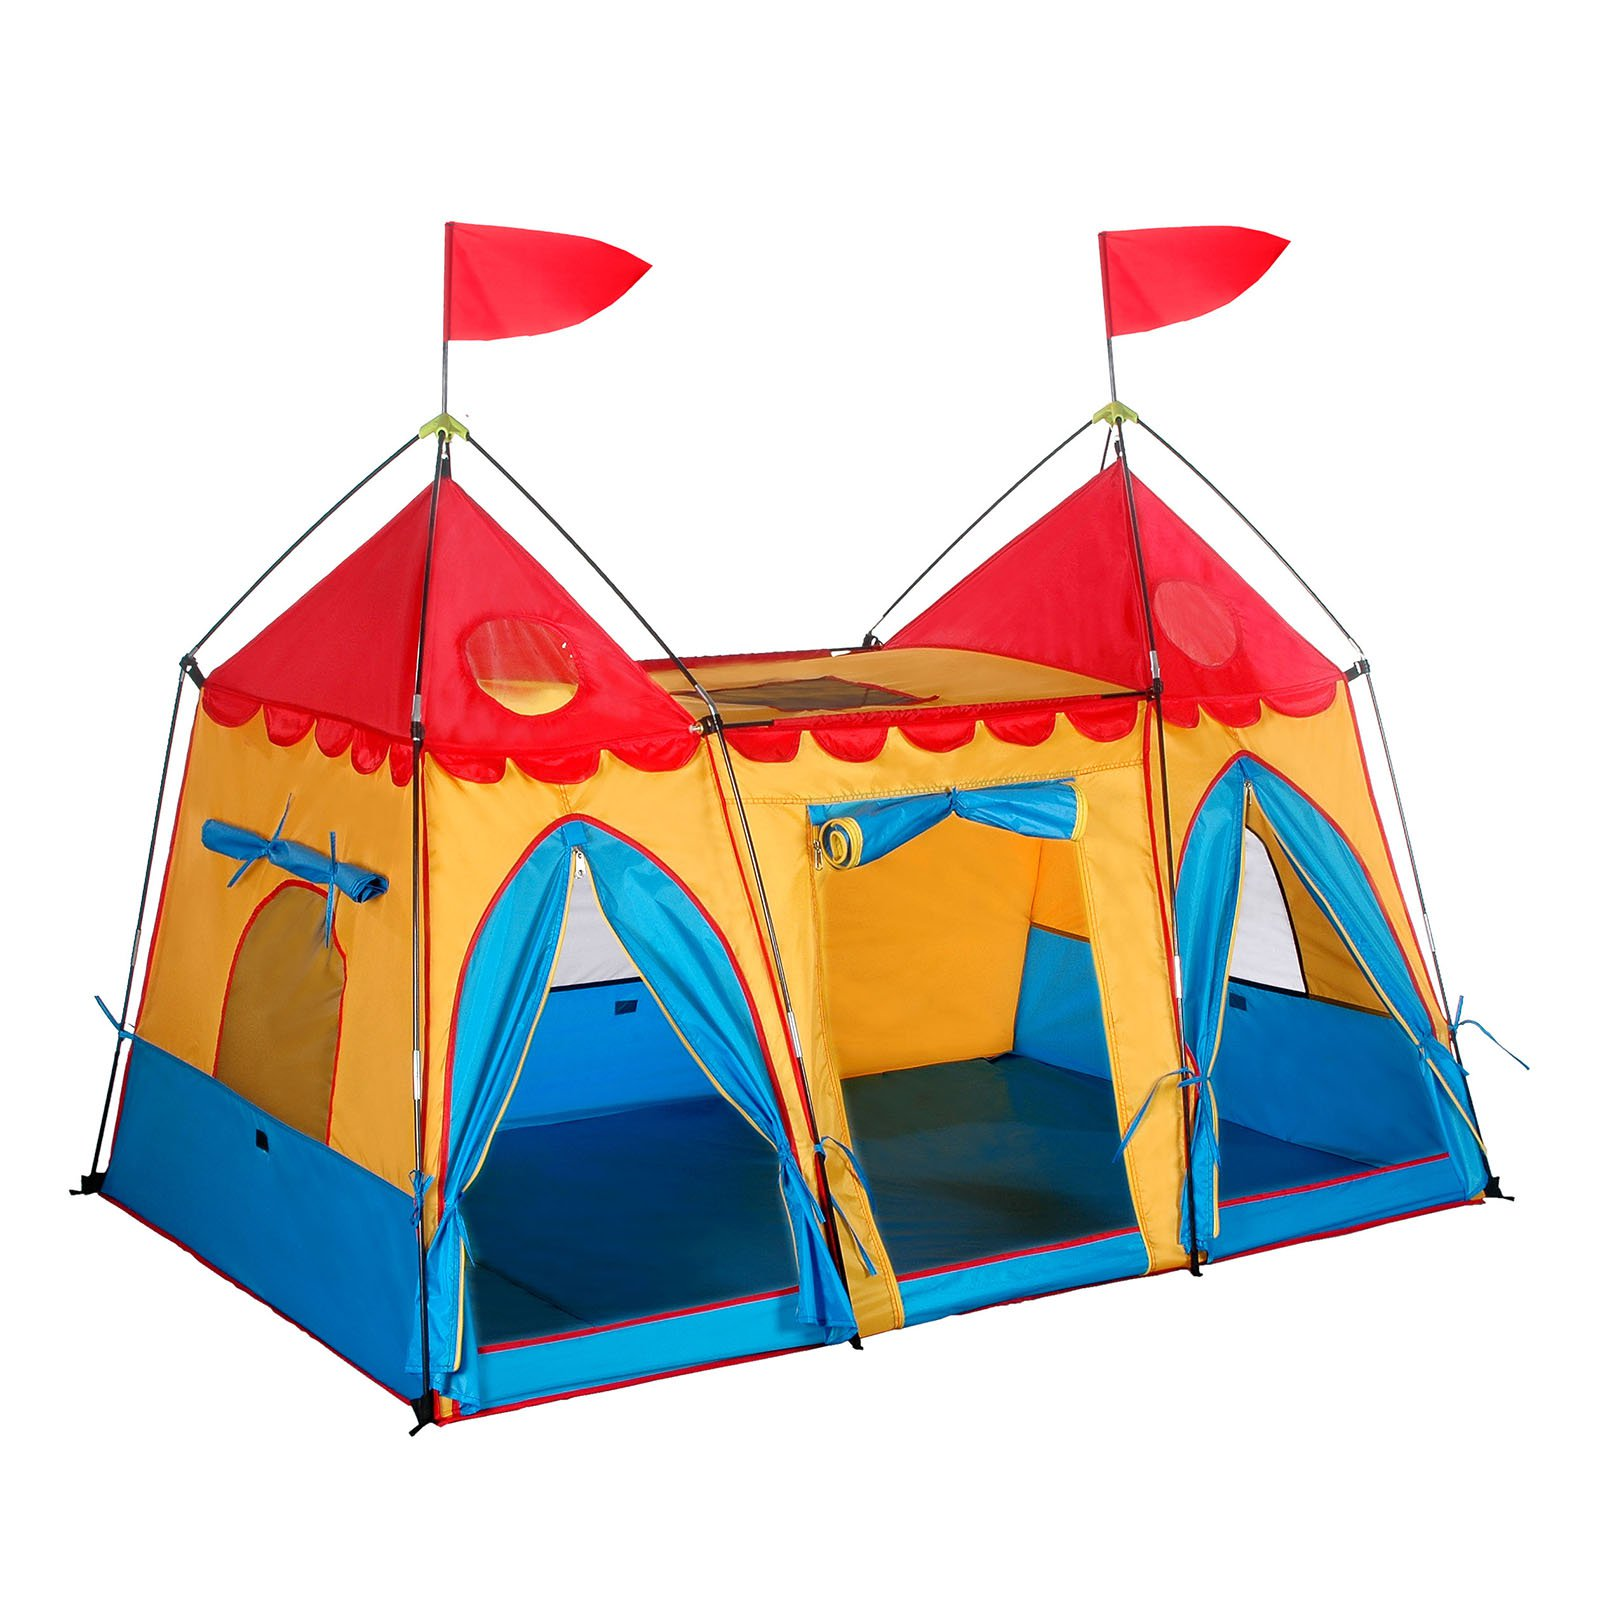 0815886010407  sc 1 st  eBay & Gigatent Fantasy Palace Play Tent Children Kids Pretend Roleplay ...